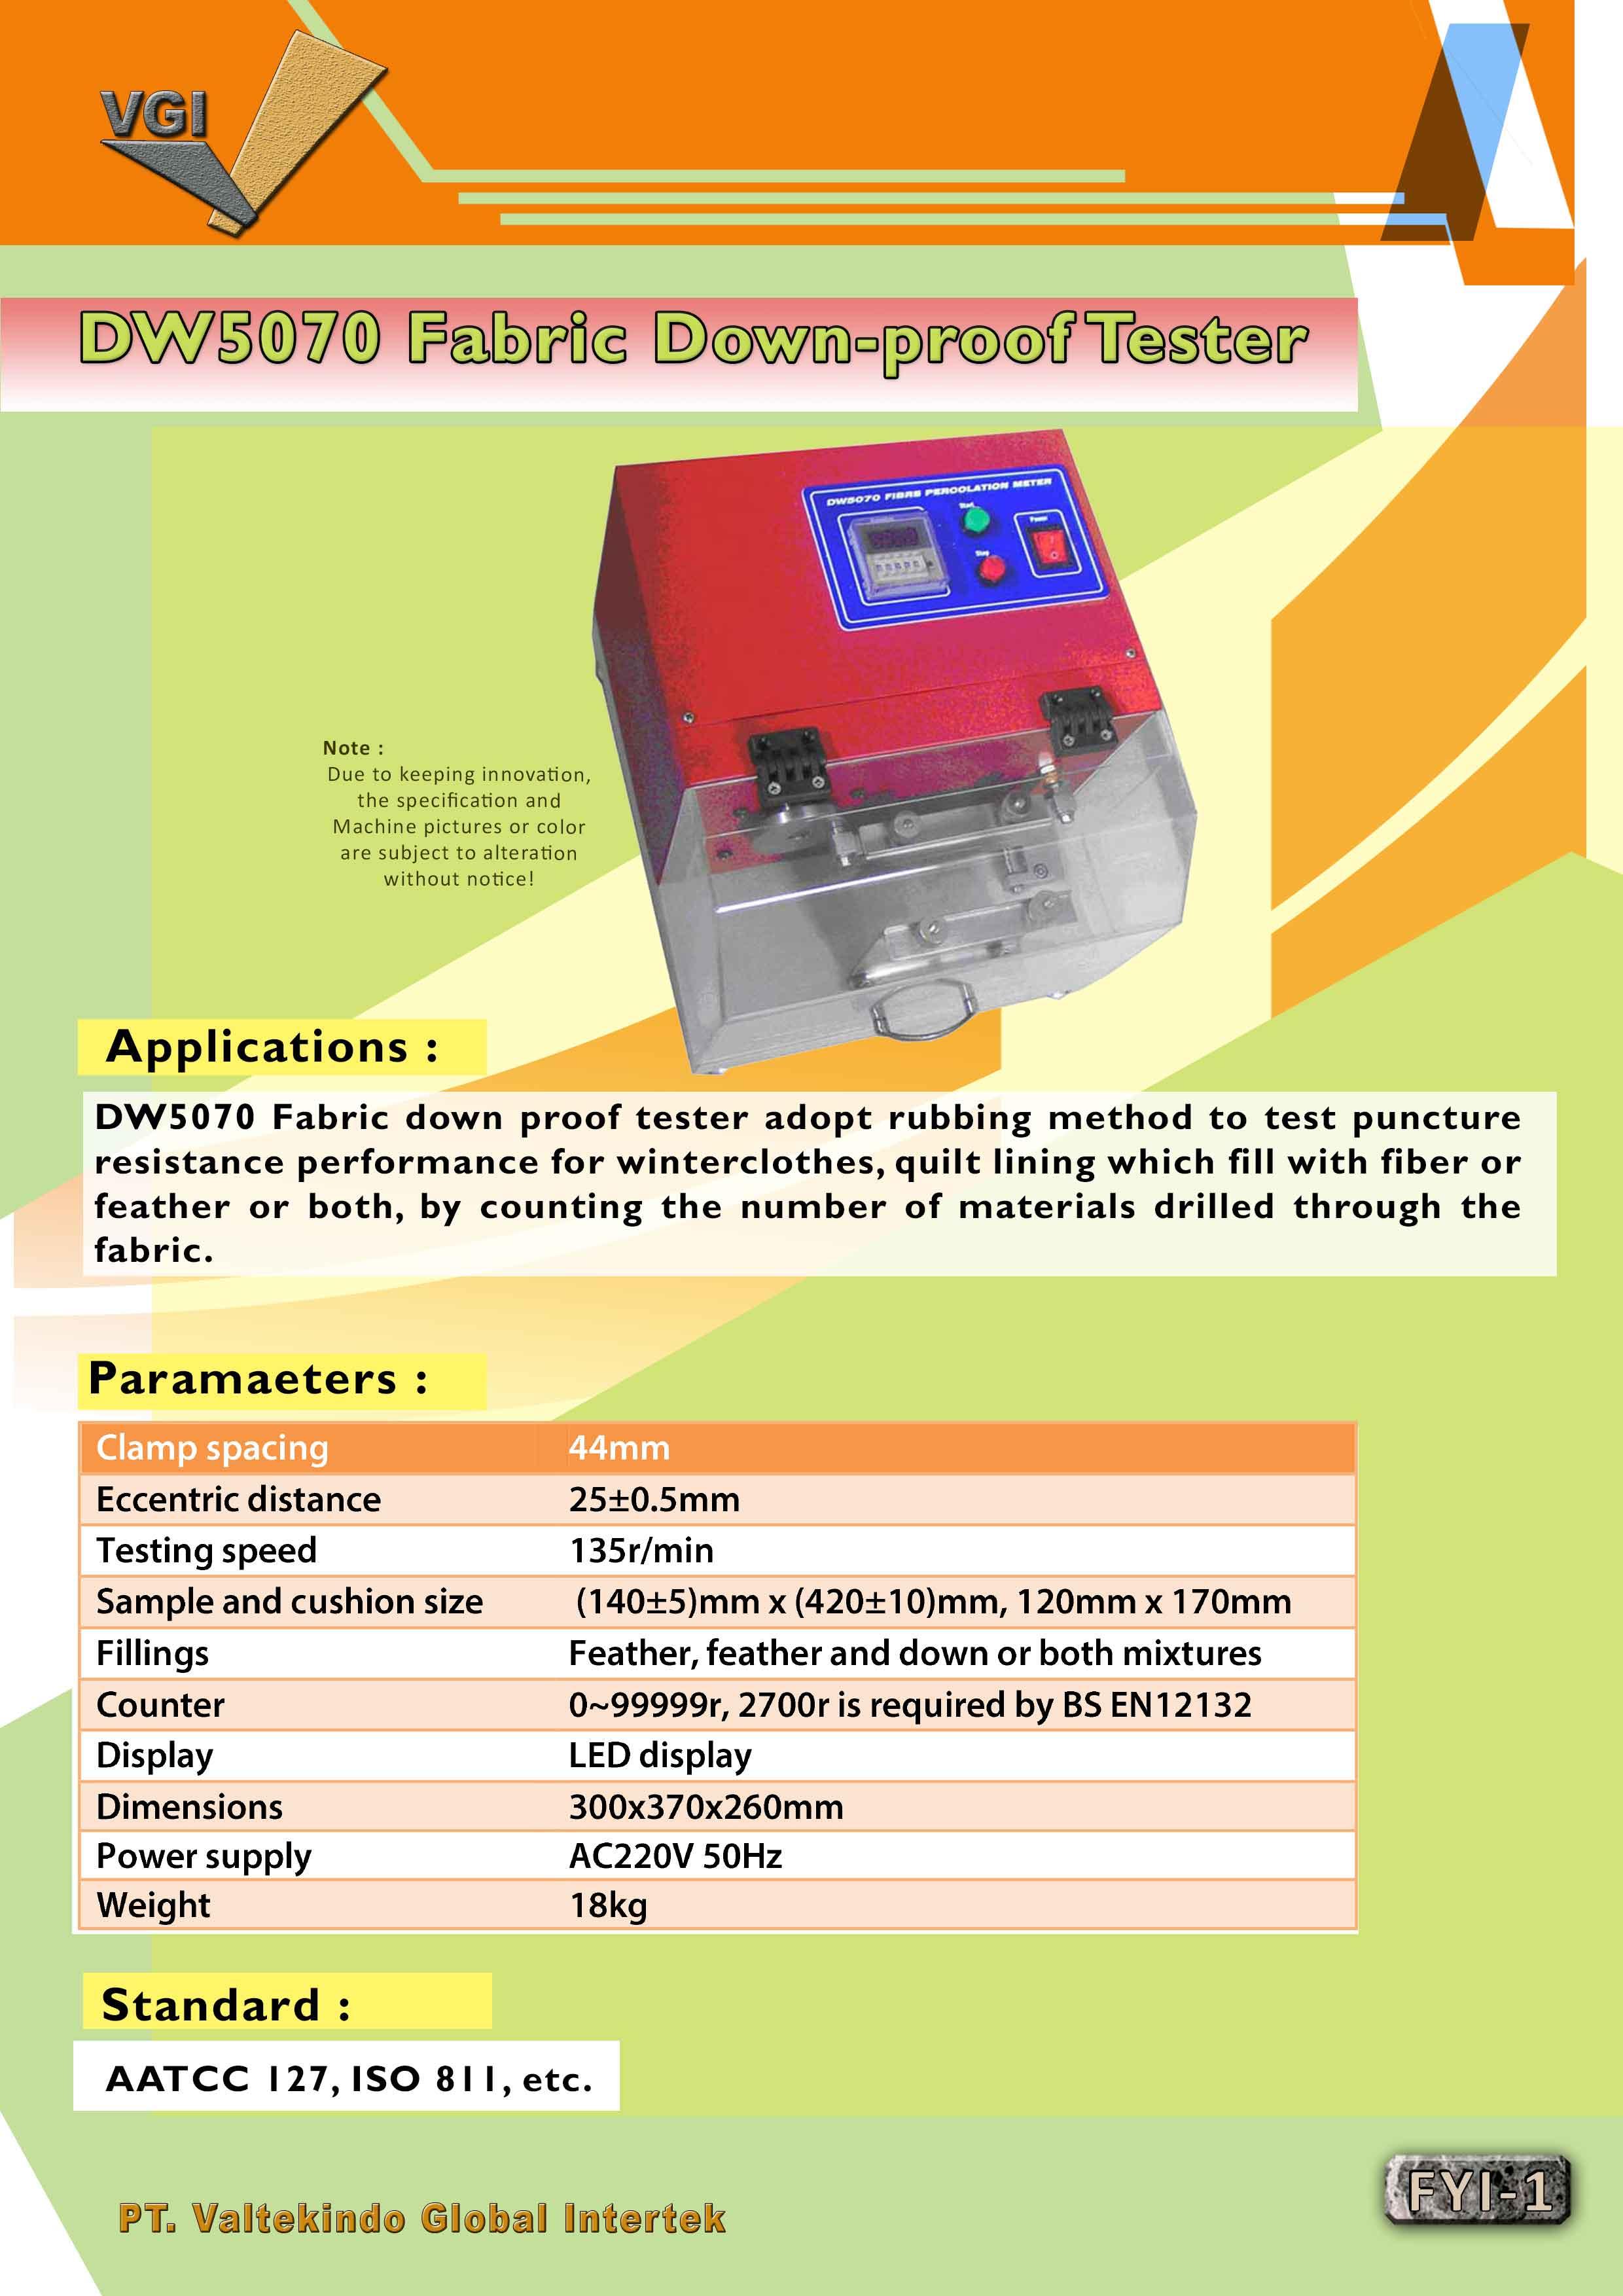 jual mesin, harga mesin, jual mesin bandung, distributor mesin, jual mesin karet, daur ulang karet, daur ulang plastik, mesin pertanian Fabric Down-Proof Tester  Fabric Down-Proof Tester